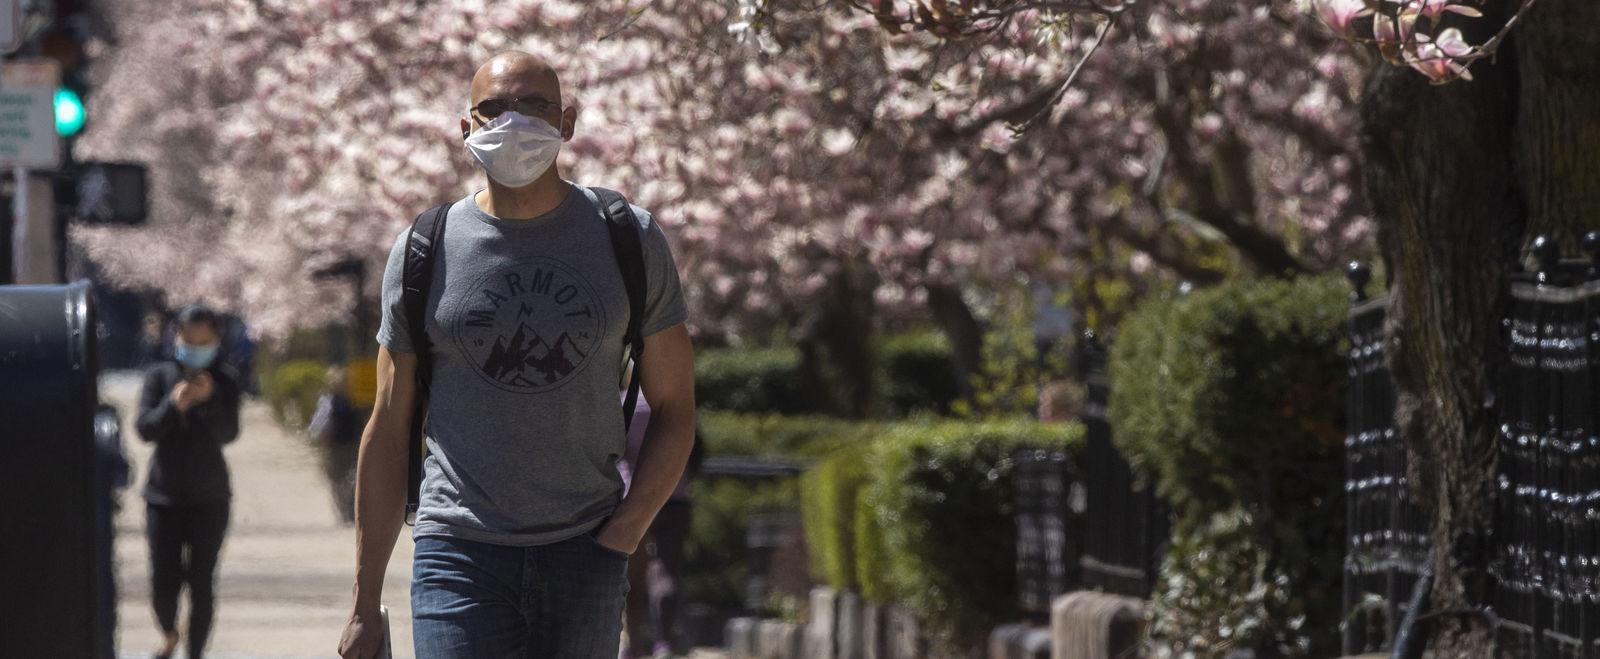 A masked man walks in Boston during spring.